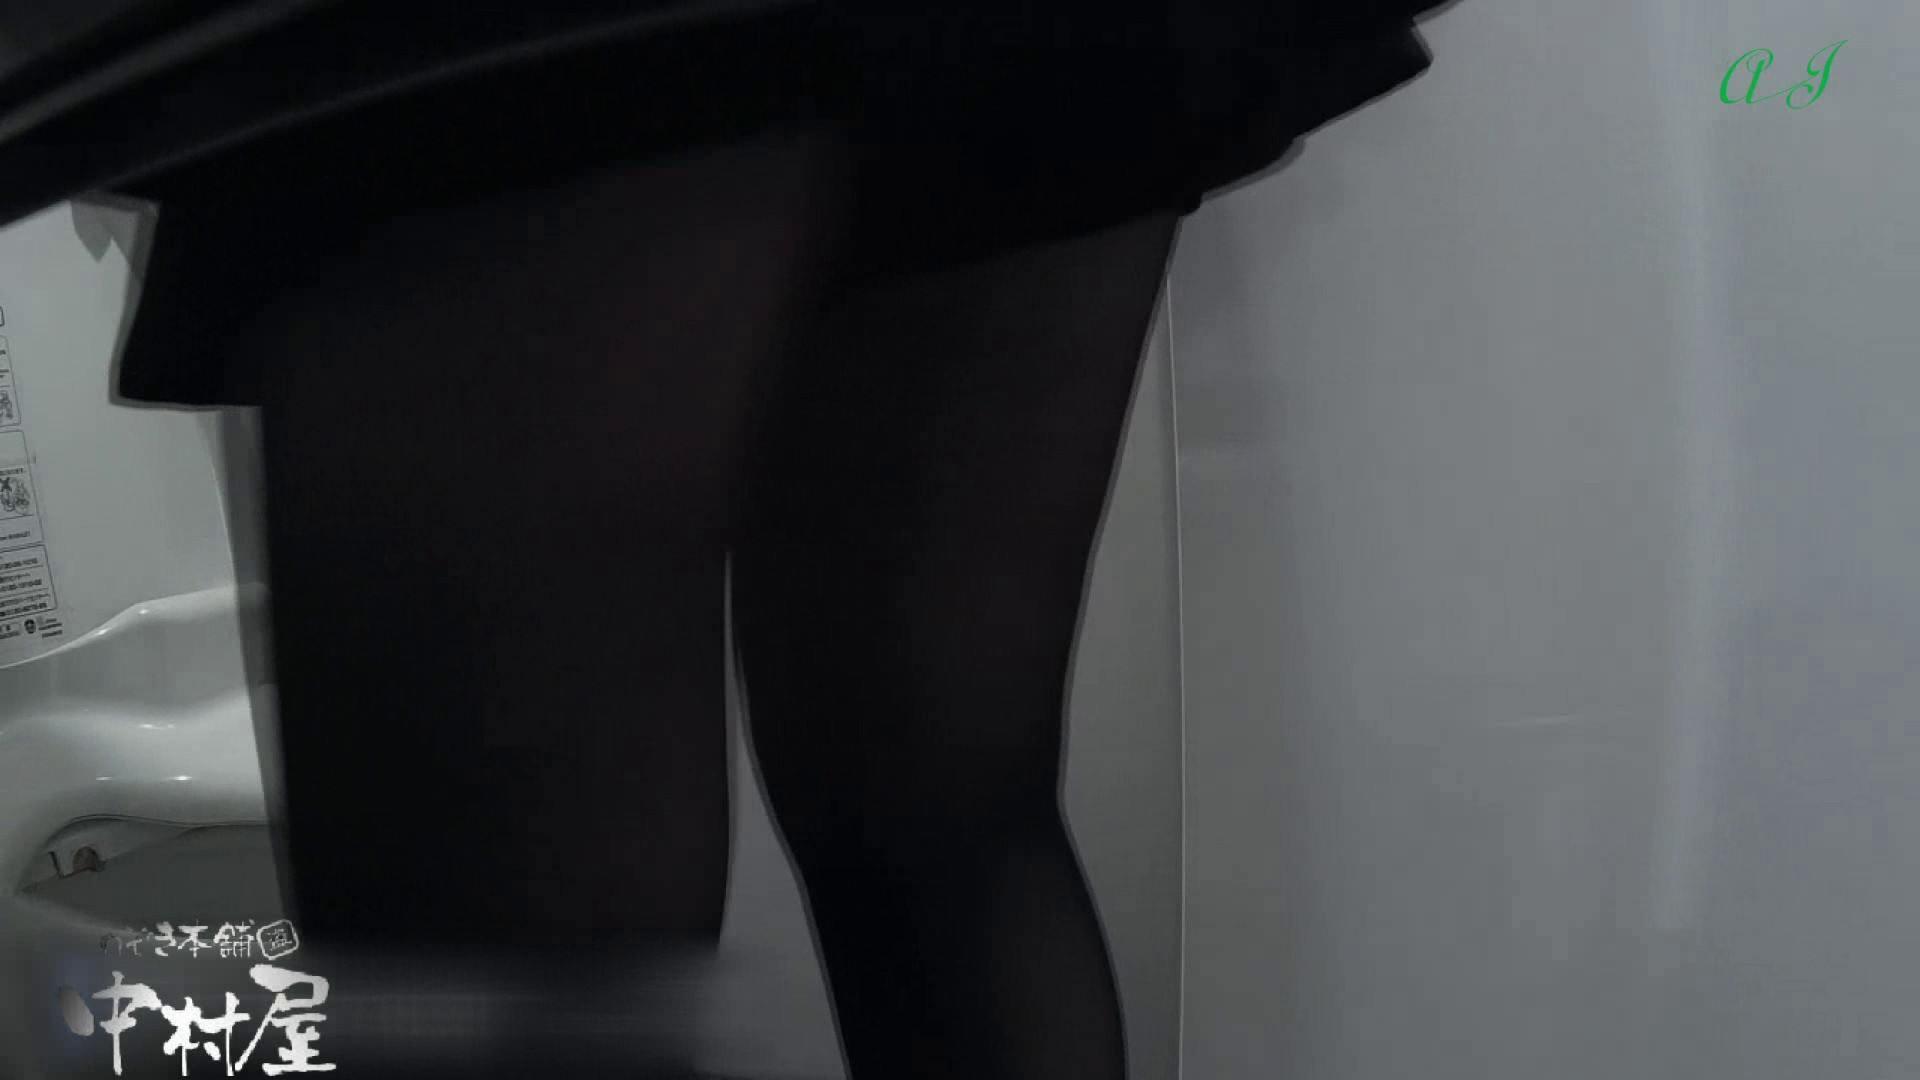 有名大学女性洗面所 vol.79 新アングル丸見え 前編 丸見え   潜入  81PIX 77